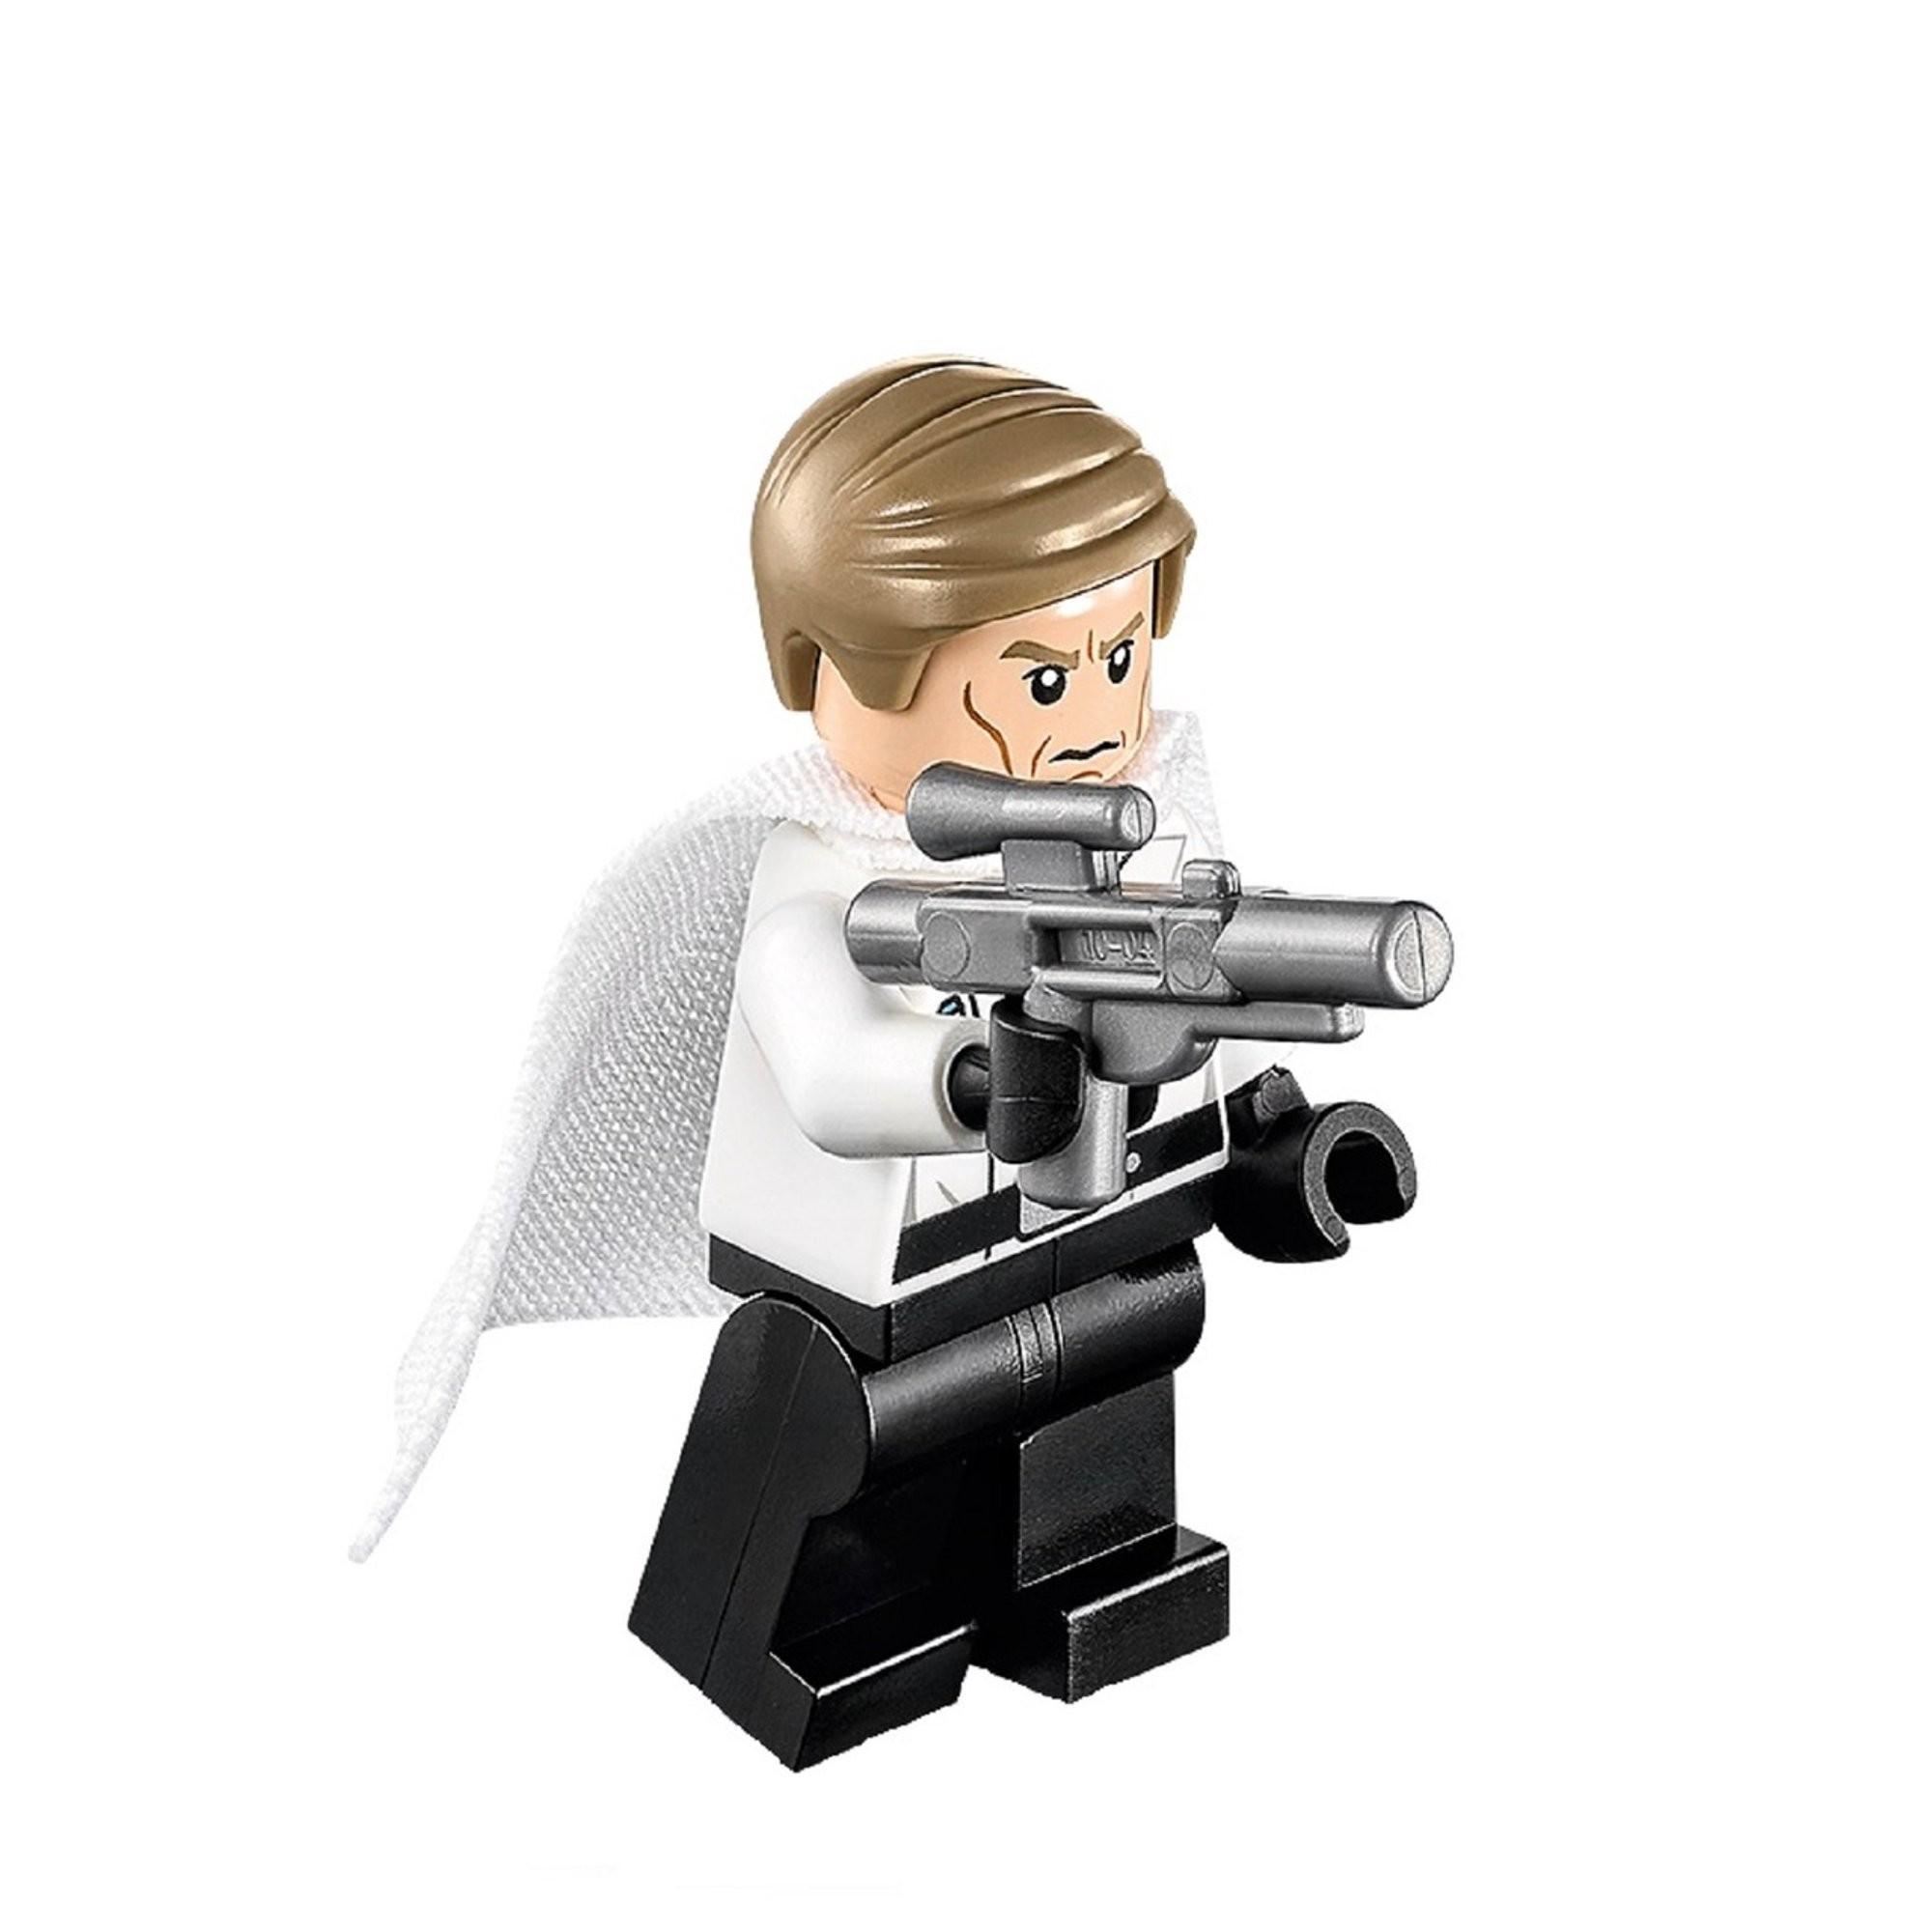 LEGO Director Krennic: Star Wars Rogue One